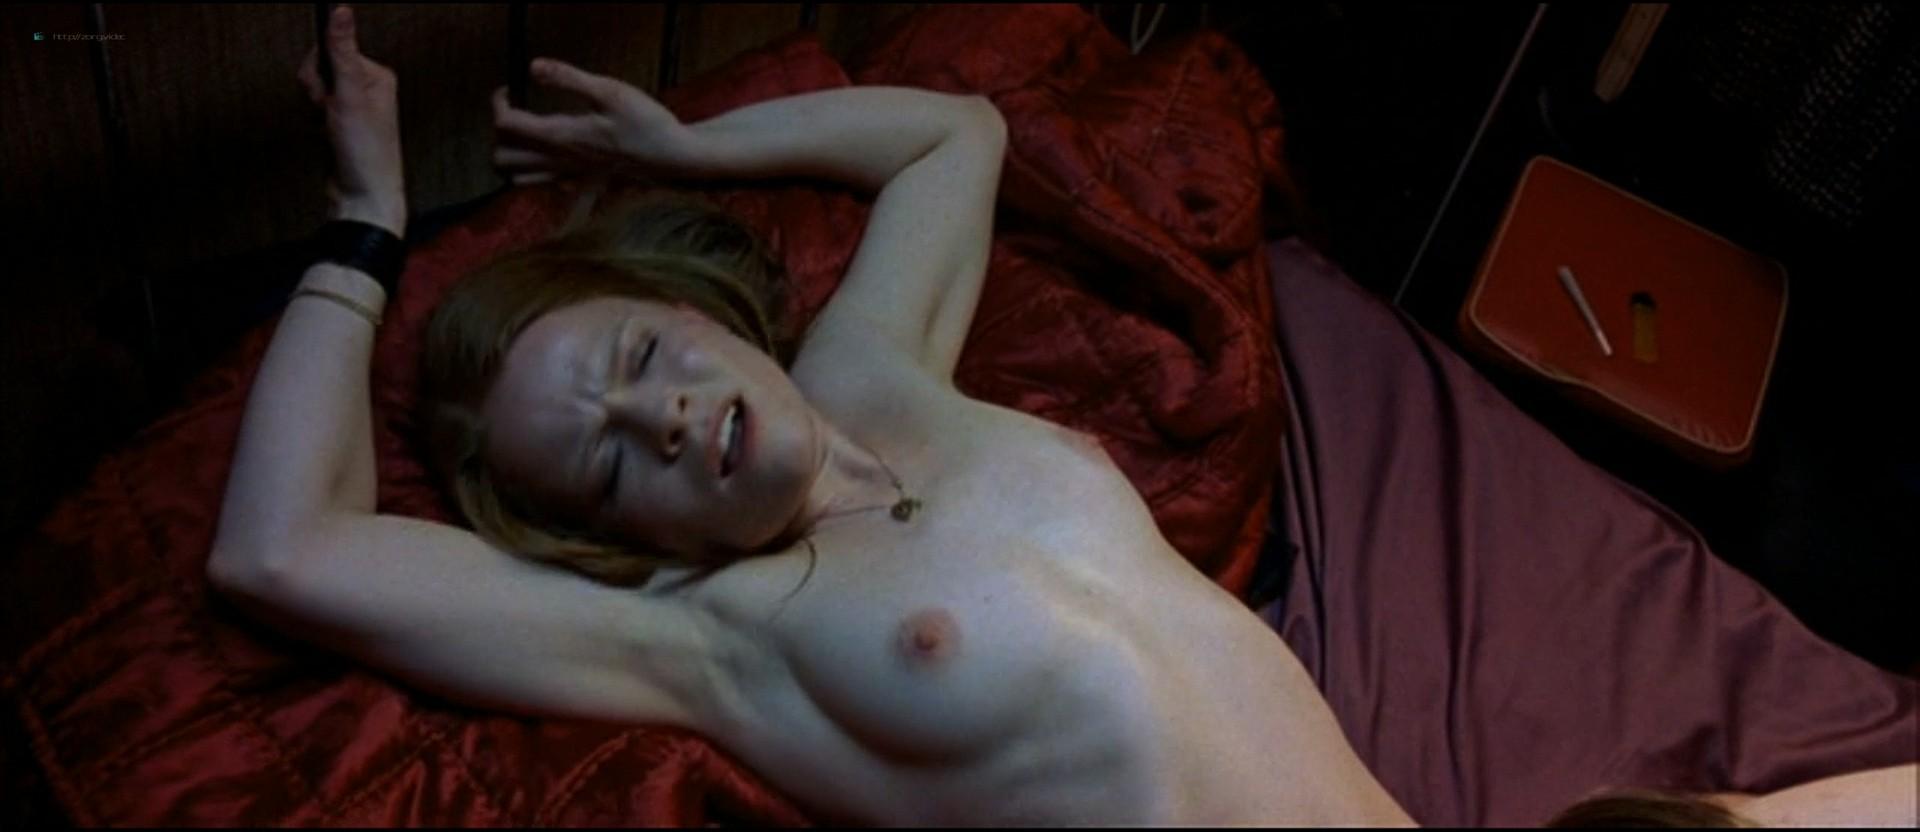 Signe Egholm Olsen nude hot sex Pernille Vallentin nude sex too - Nordkraft (DK-2005) HD 1080p Web (11)